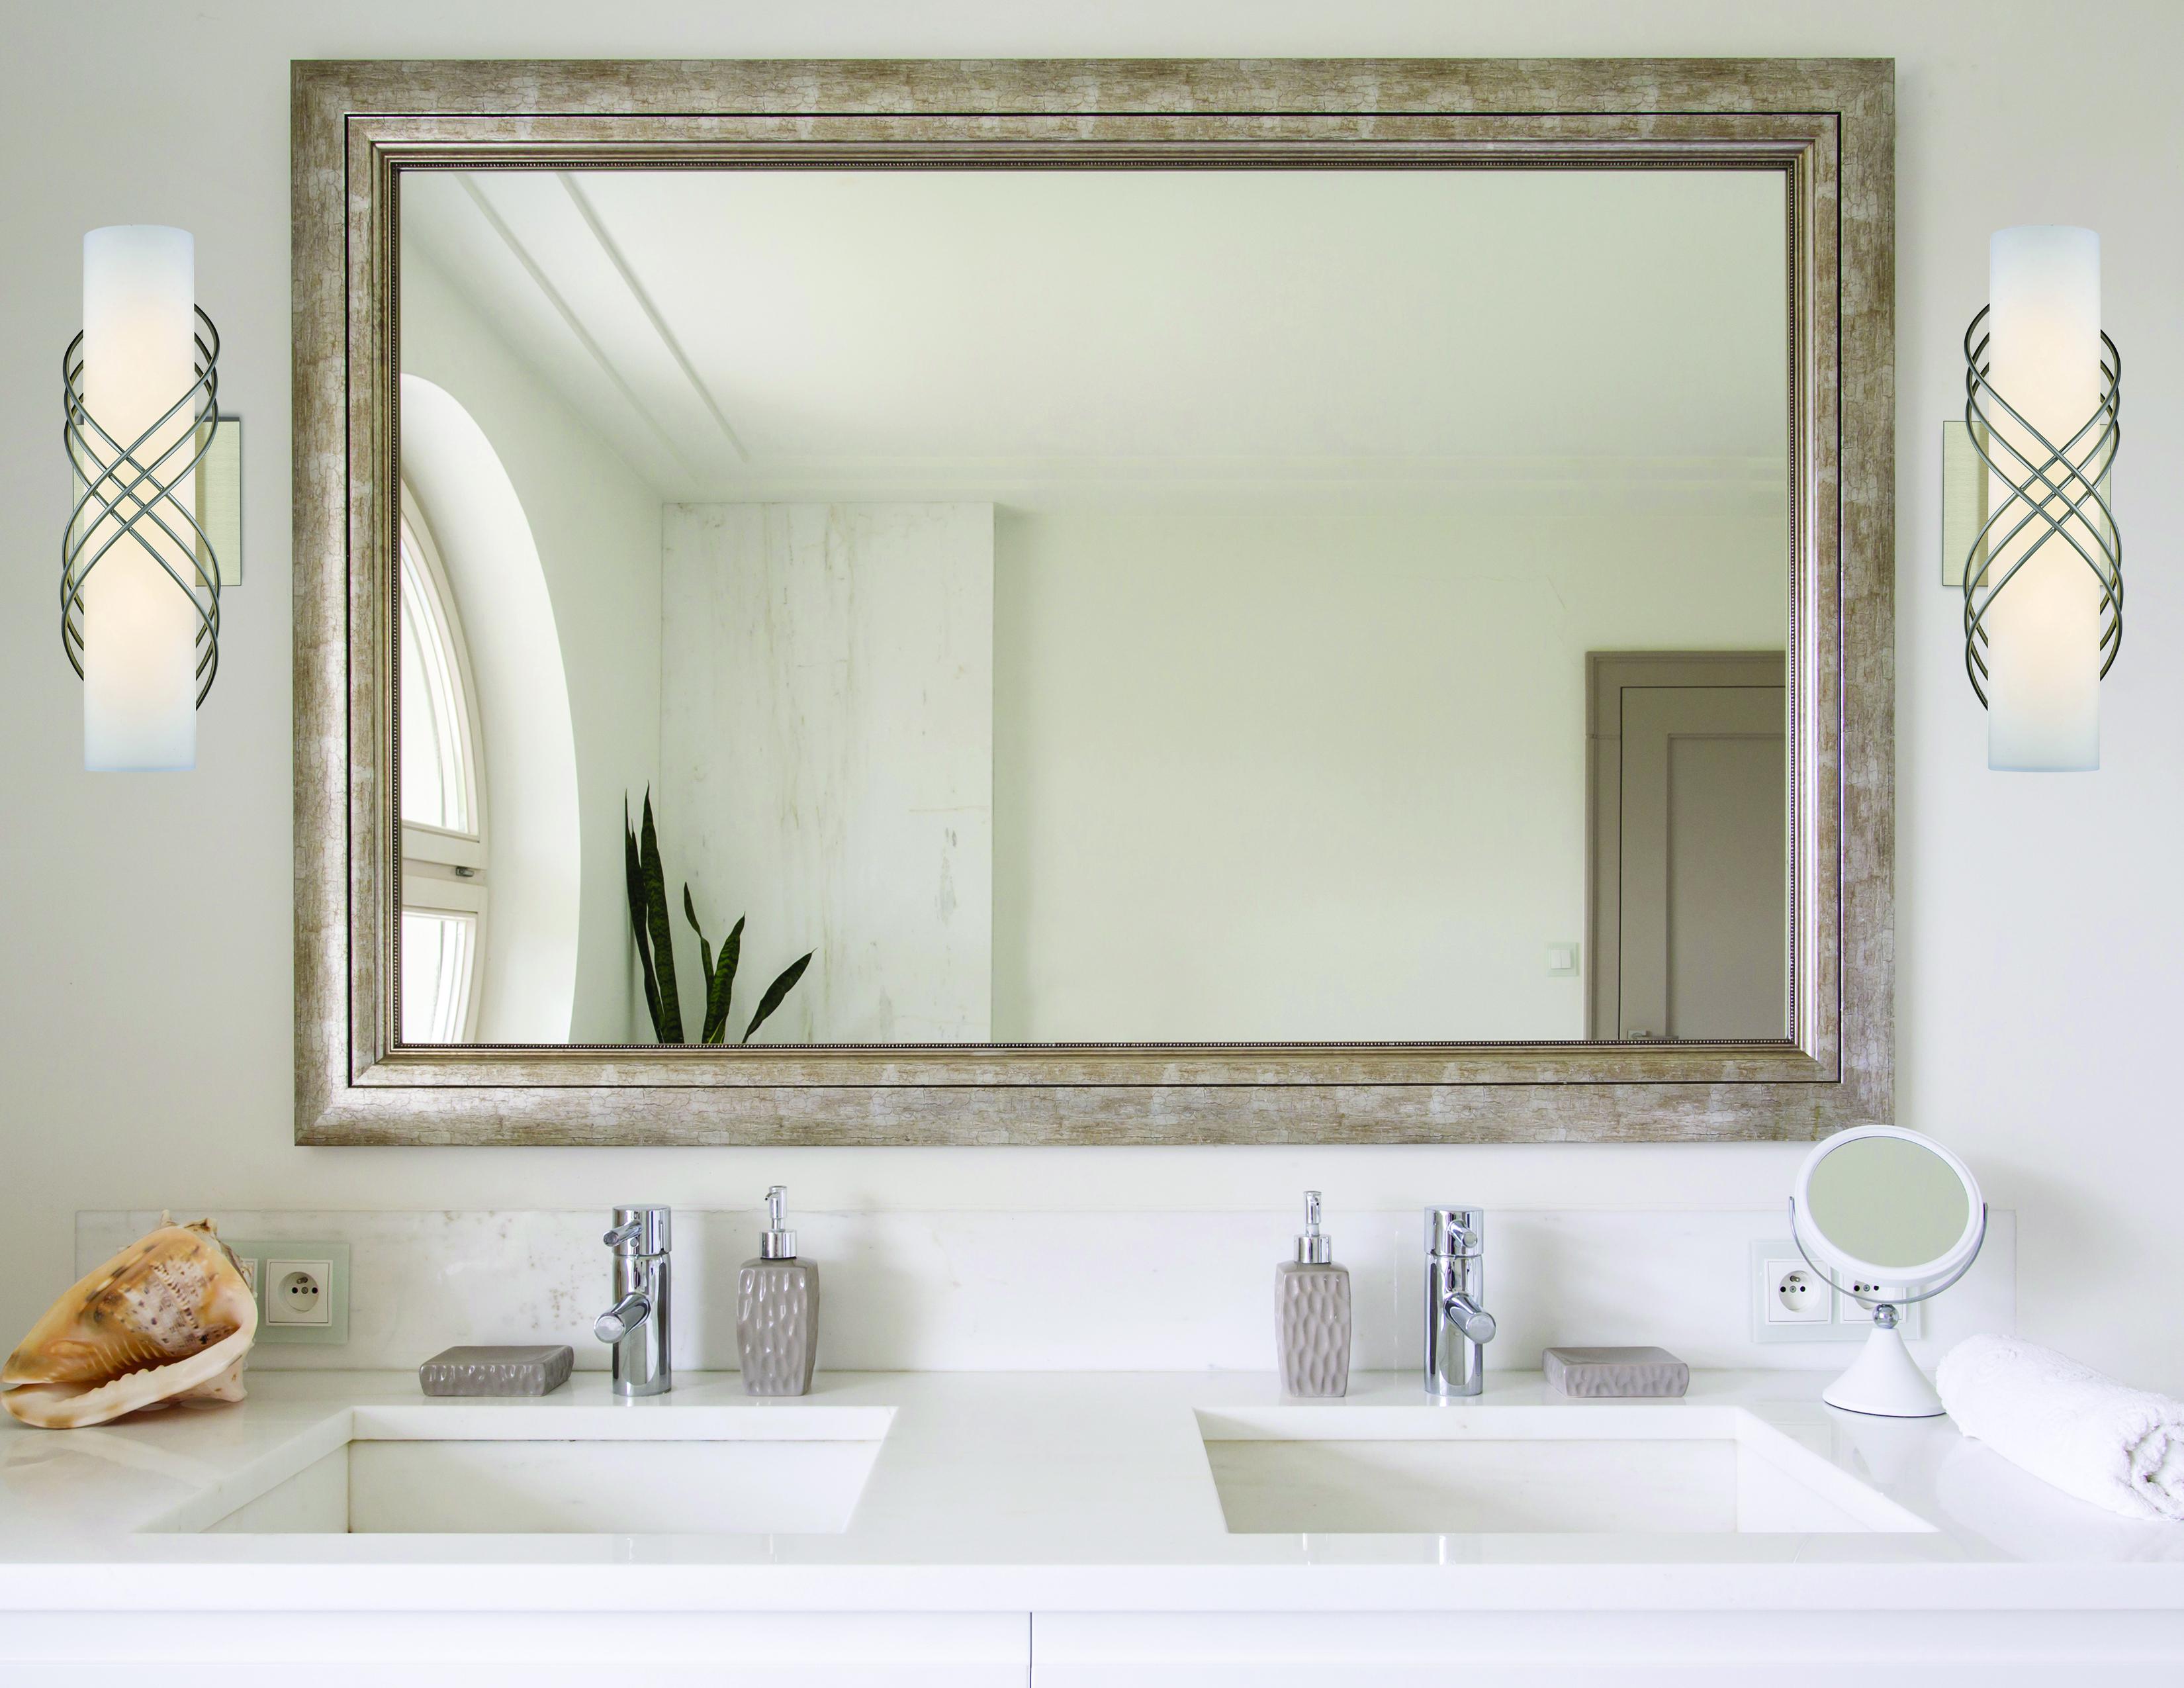 7 Bathroom Lighting Tips from the Lighting Doctor ...